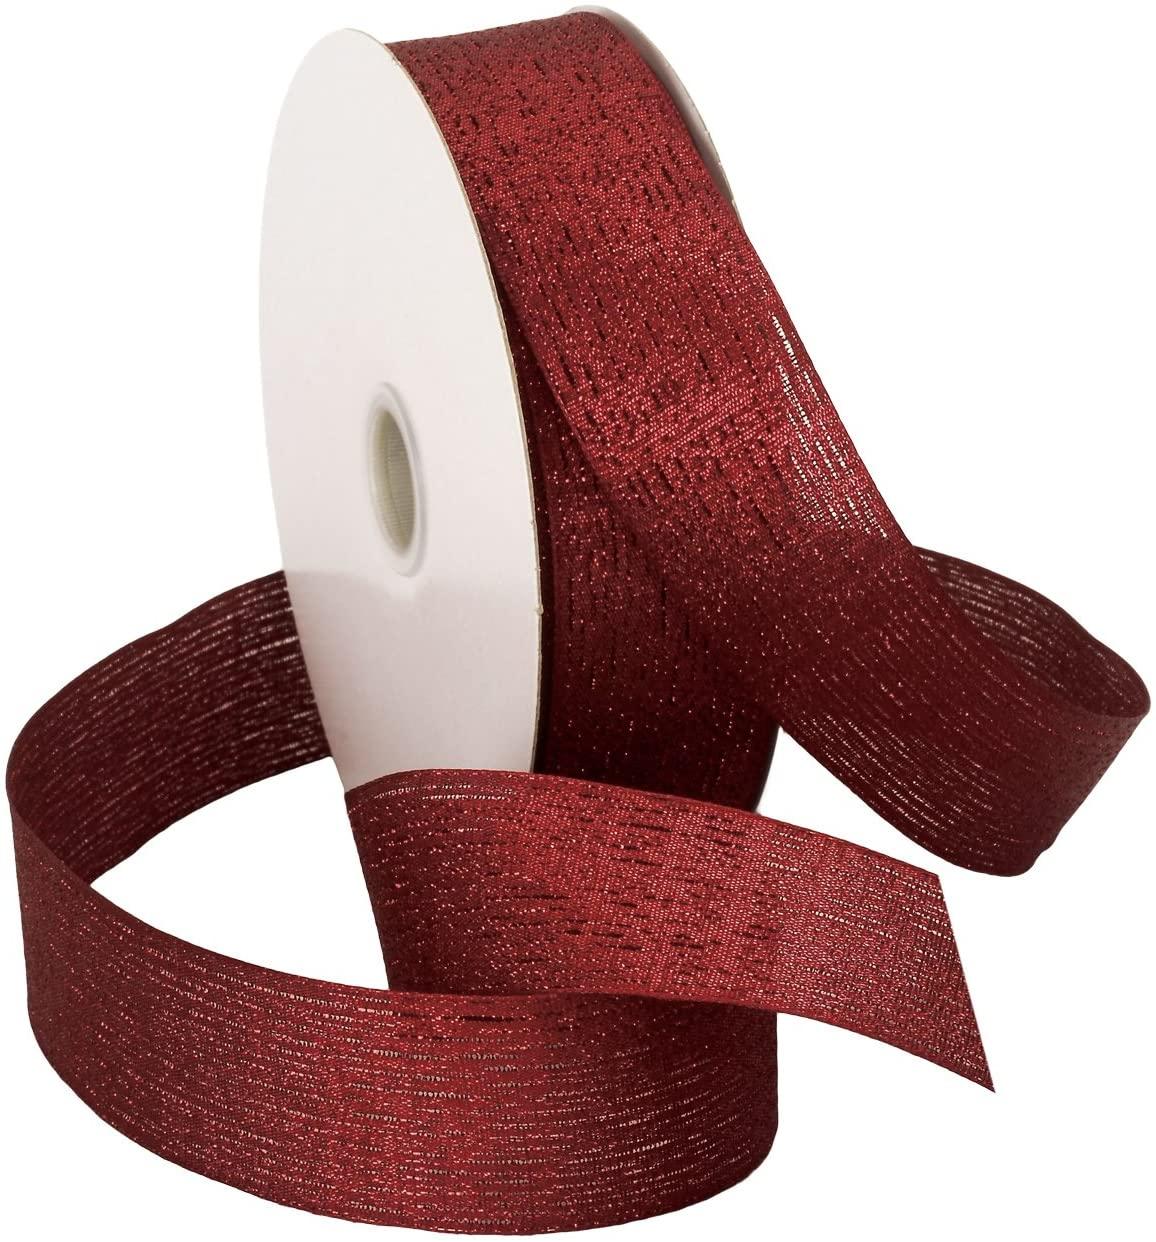 Morex Wired Vienna Glitter Ribbon, 1-1/2-Inch by 50-Yard Spool, Merlot